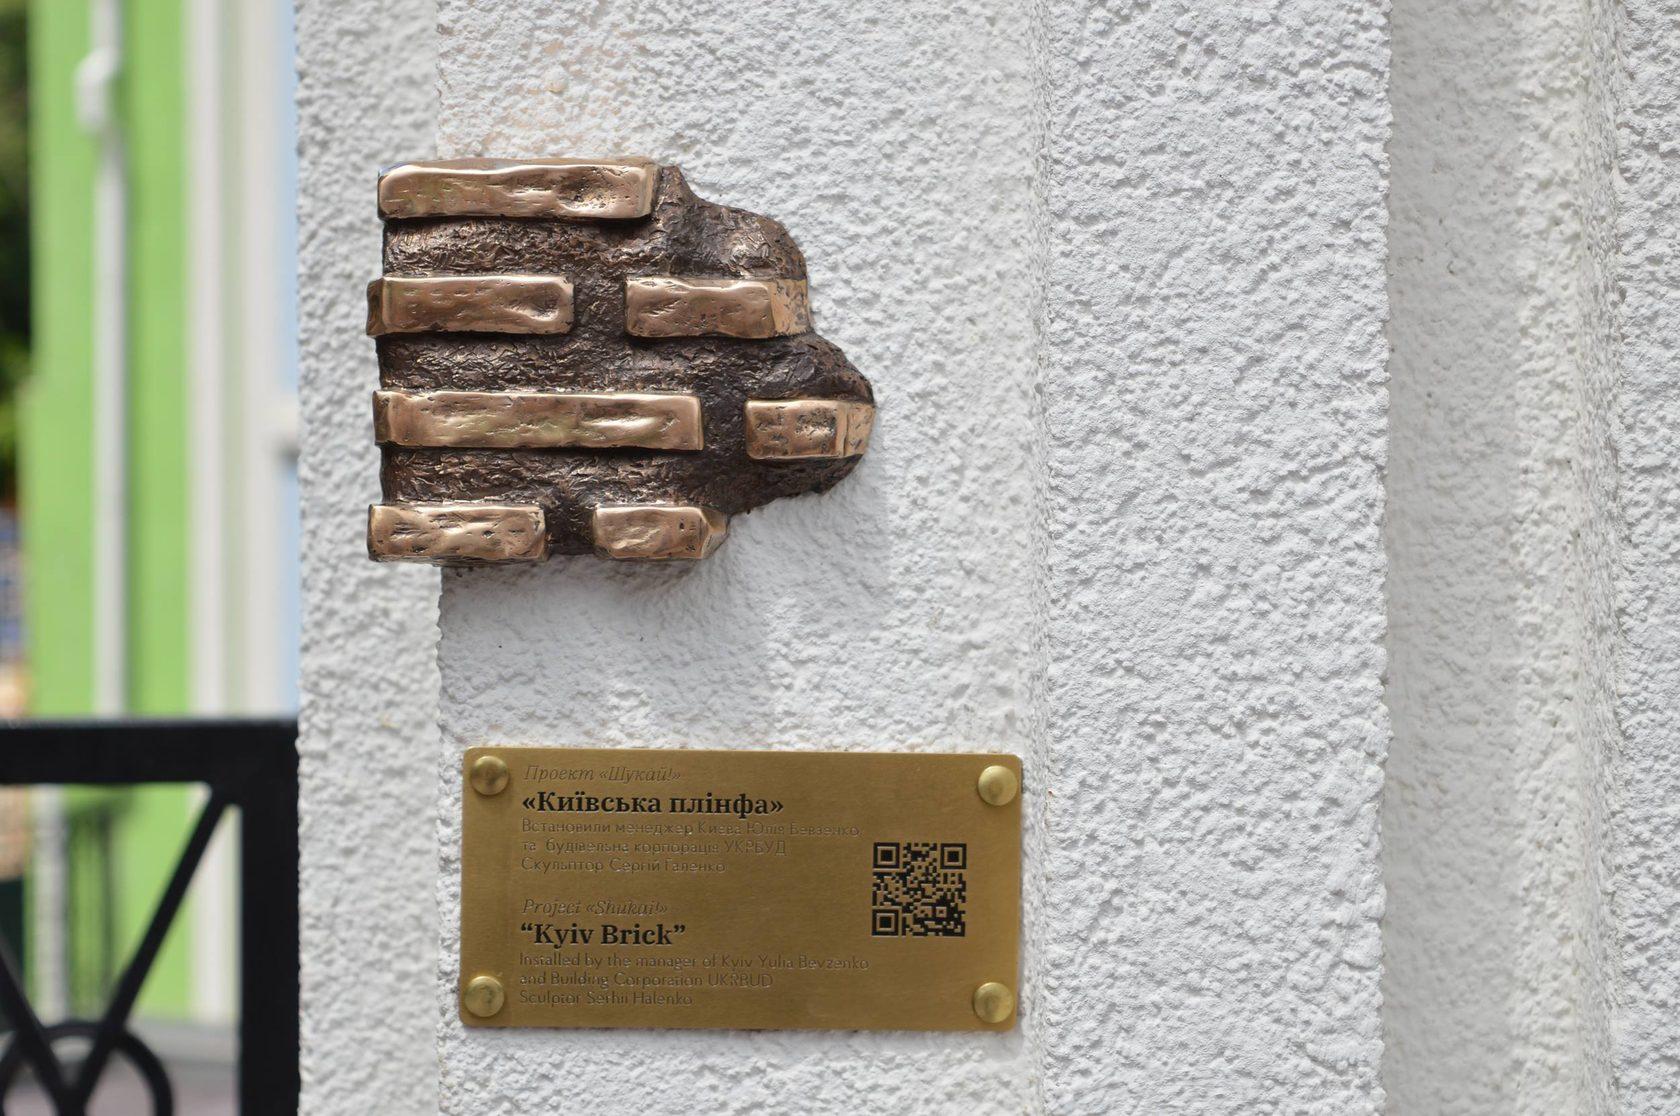 Міні-скульптура «Київська плінфа»